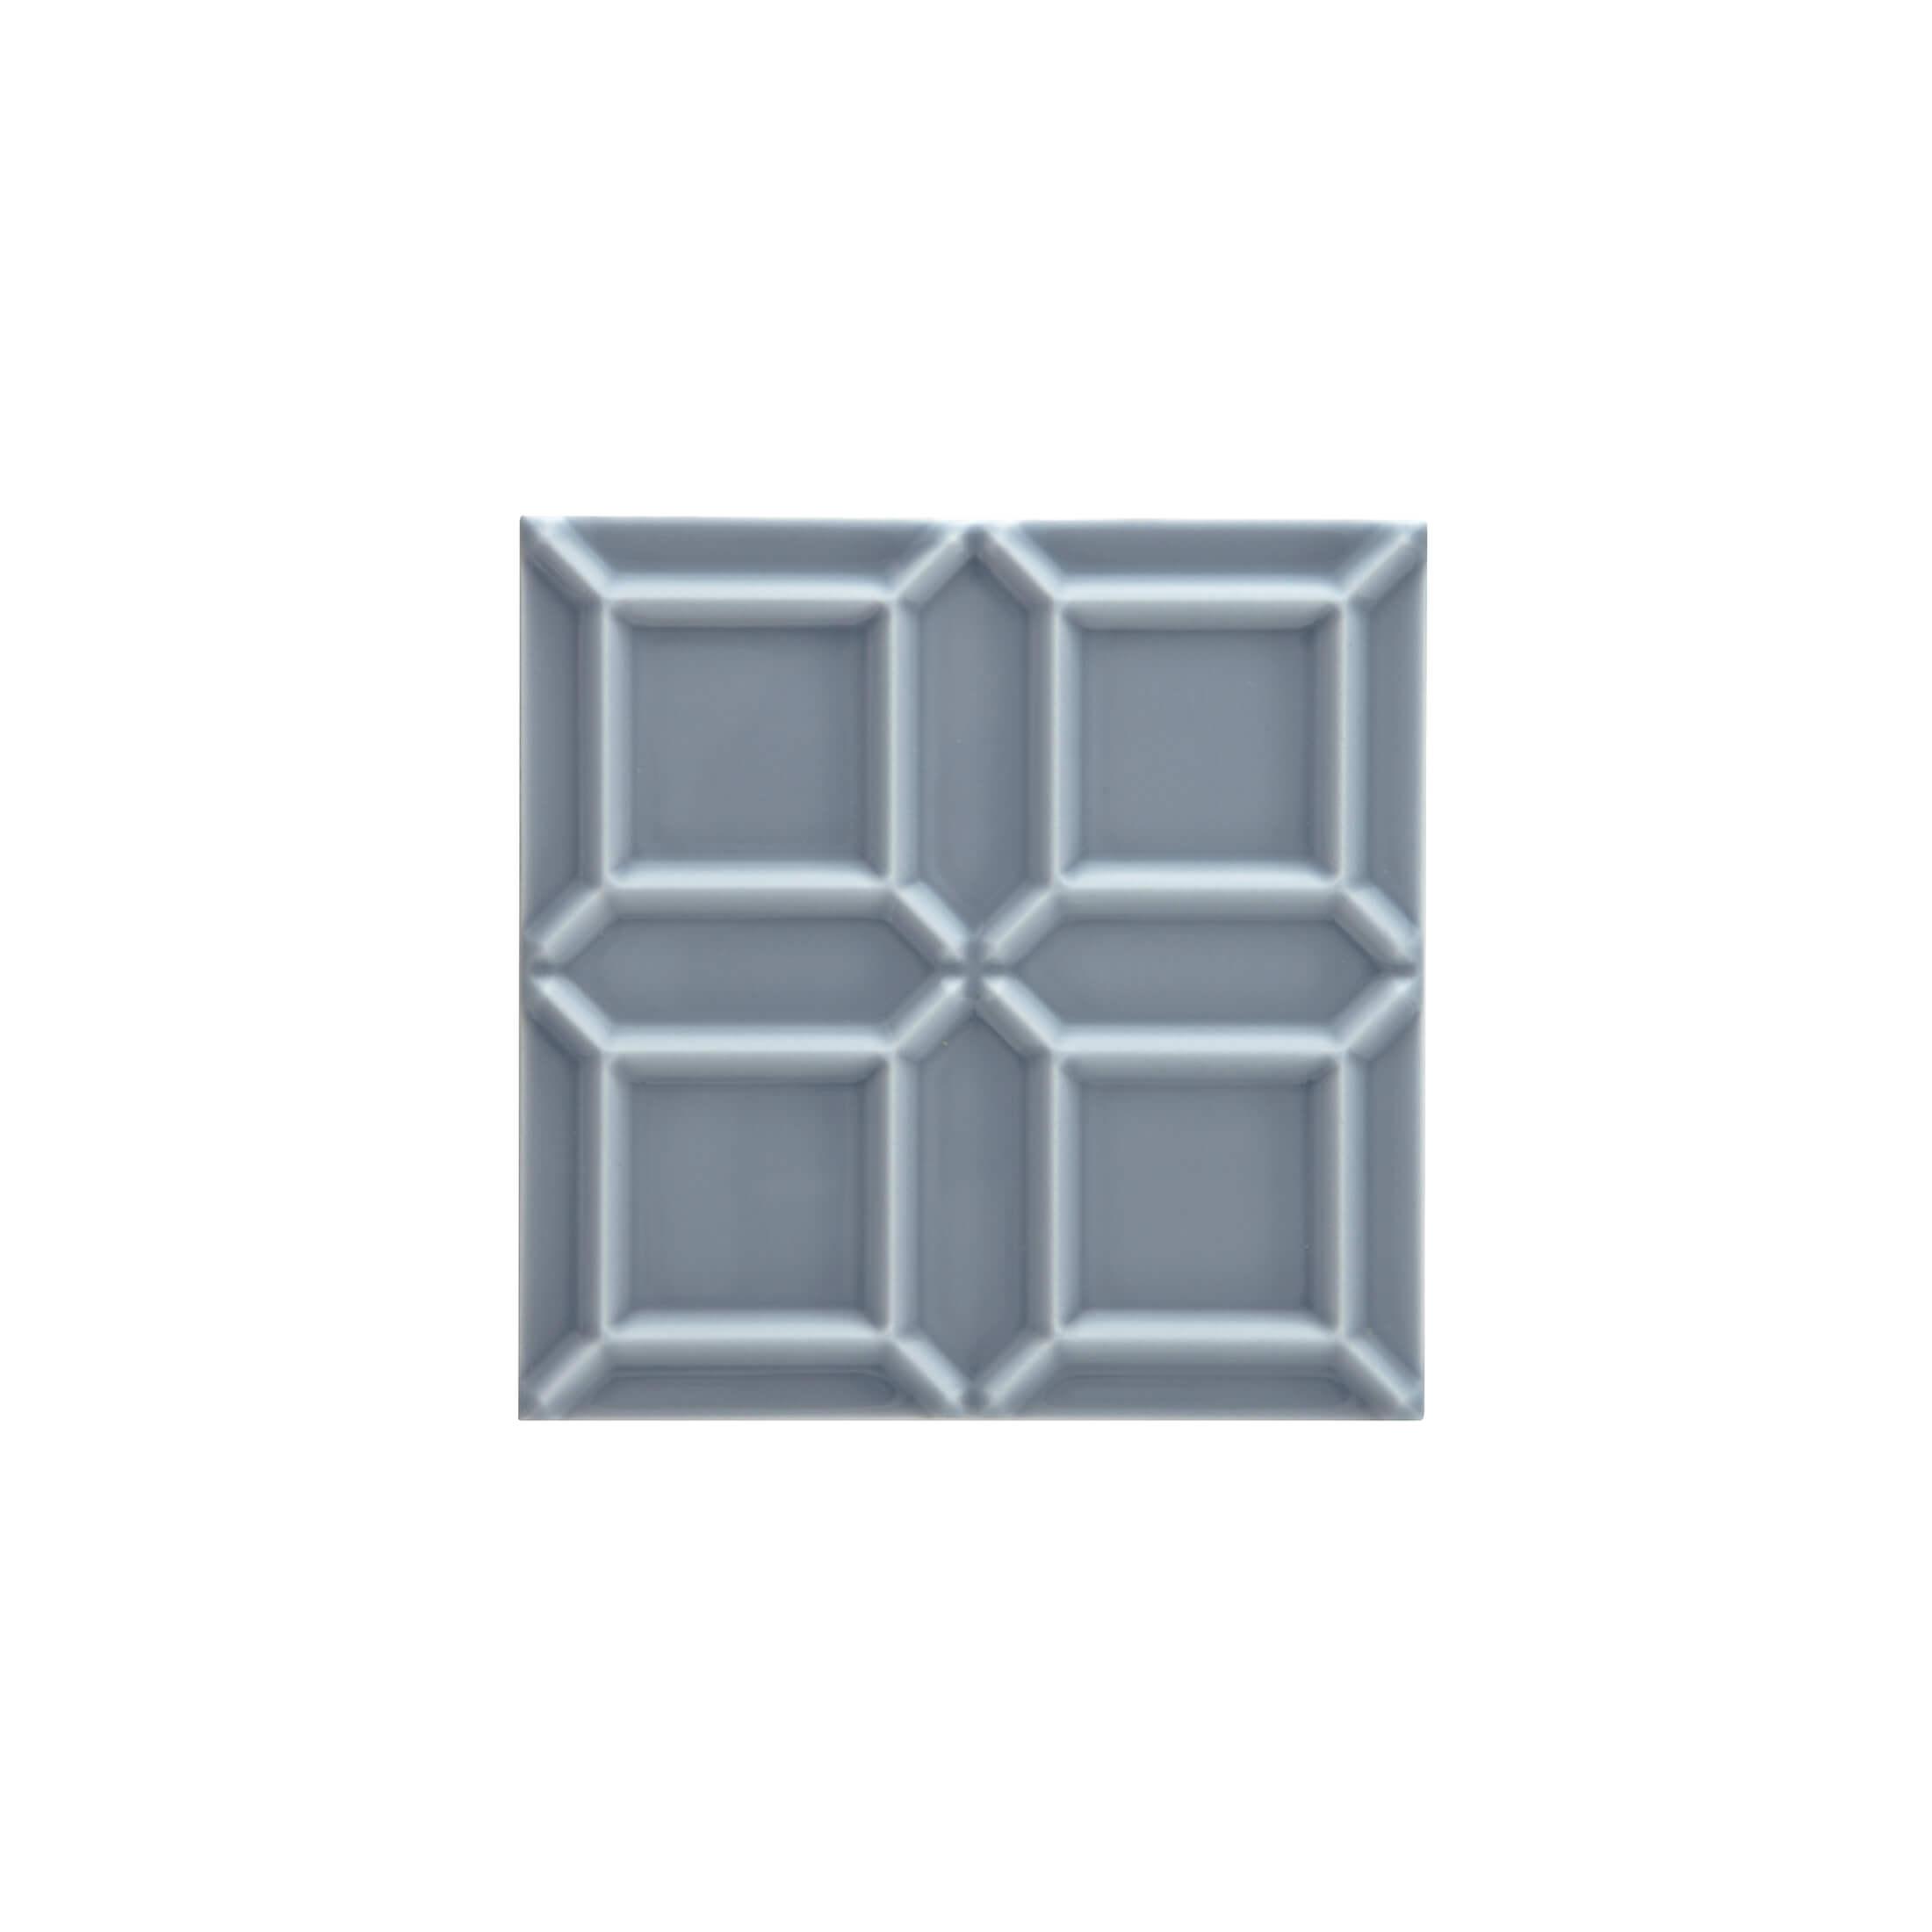 ADNE1113 - LISO EDGE - 15 cm X 15 cm